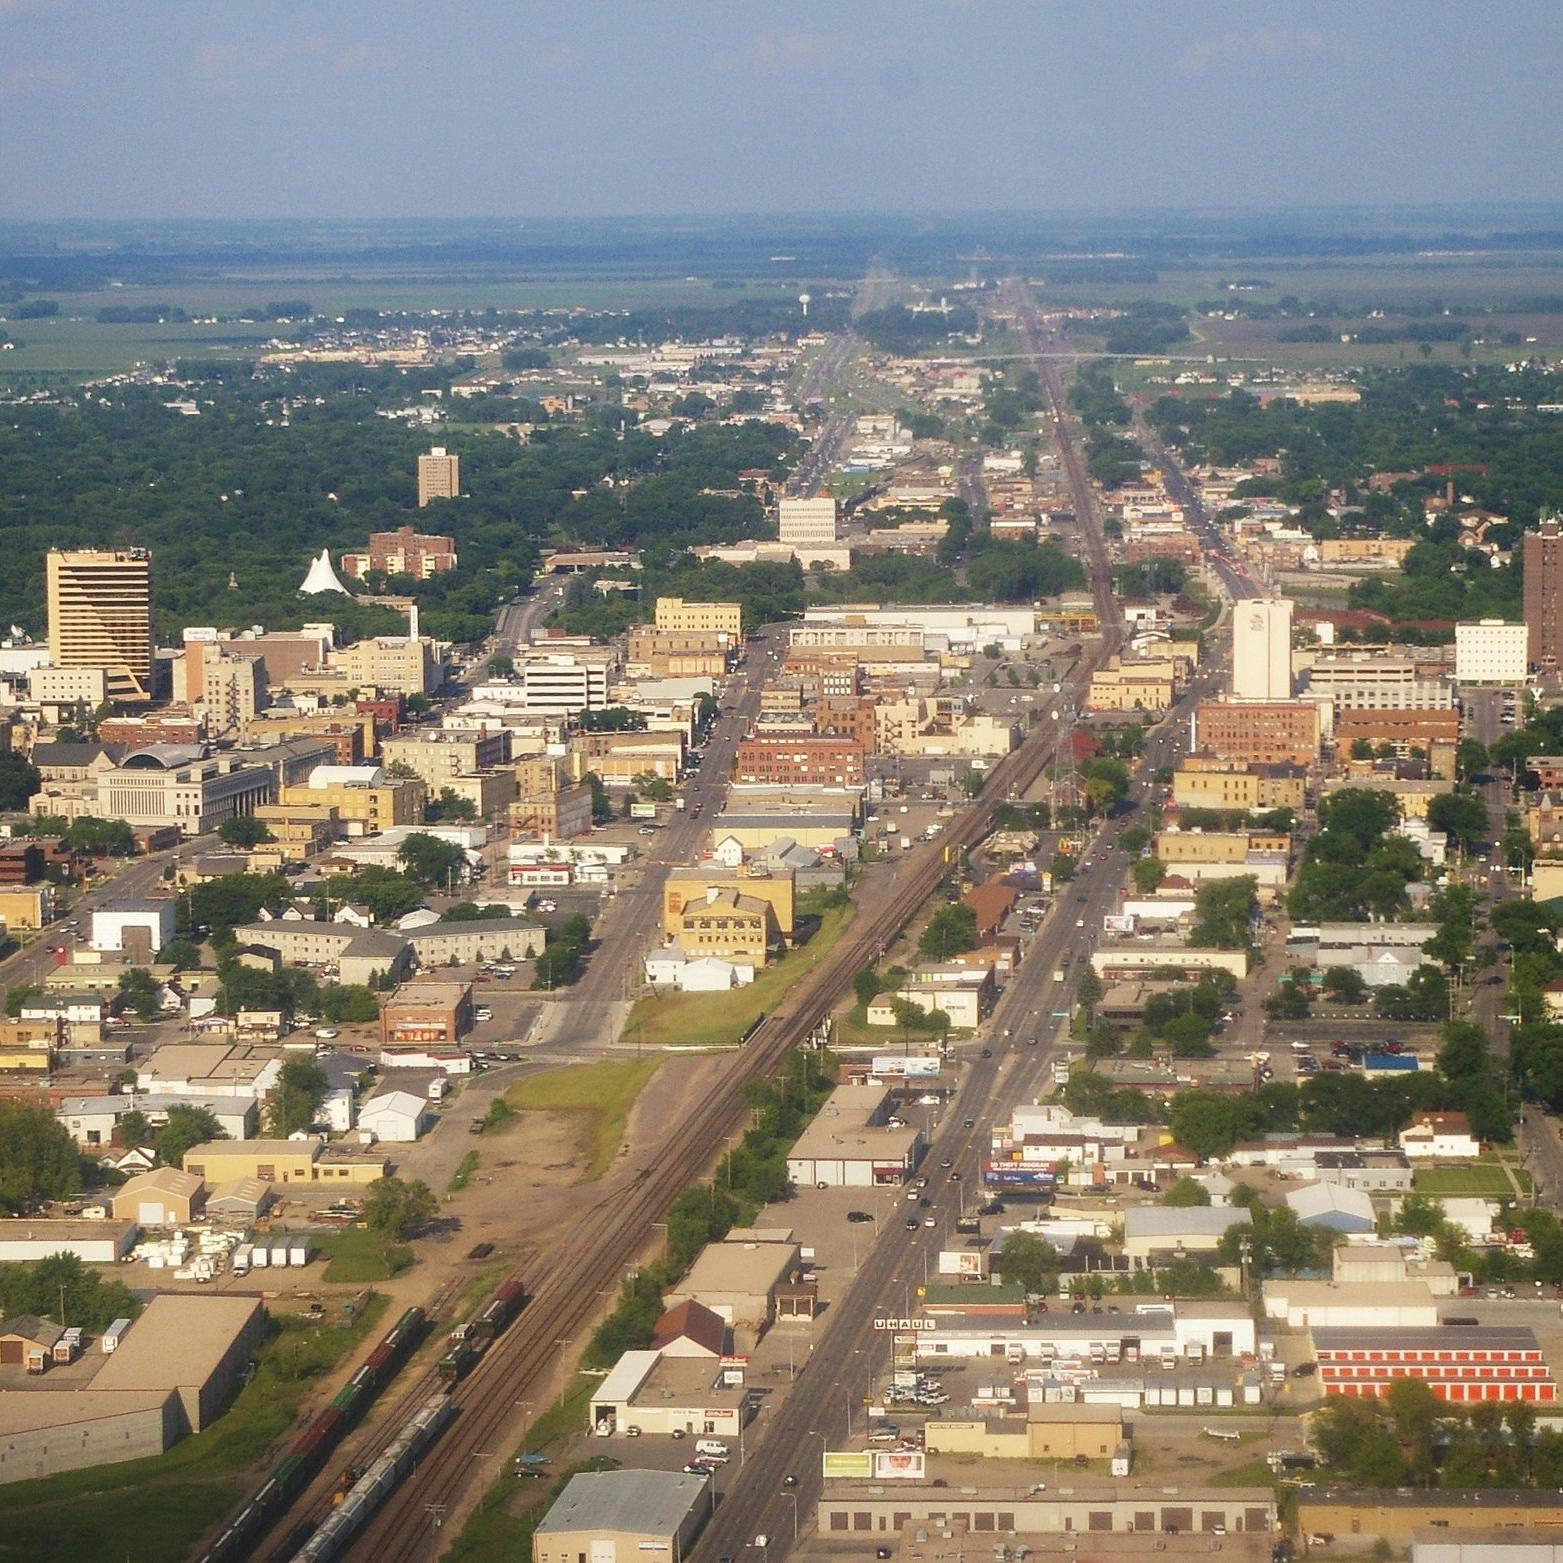 Fargo/Moorhead